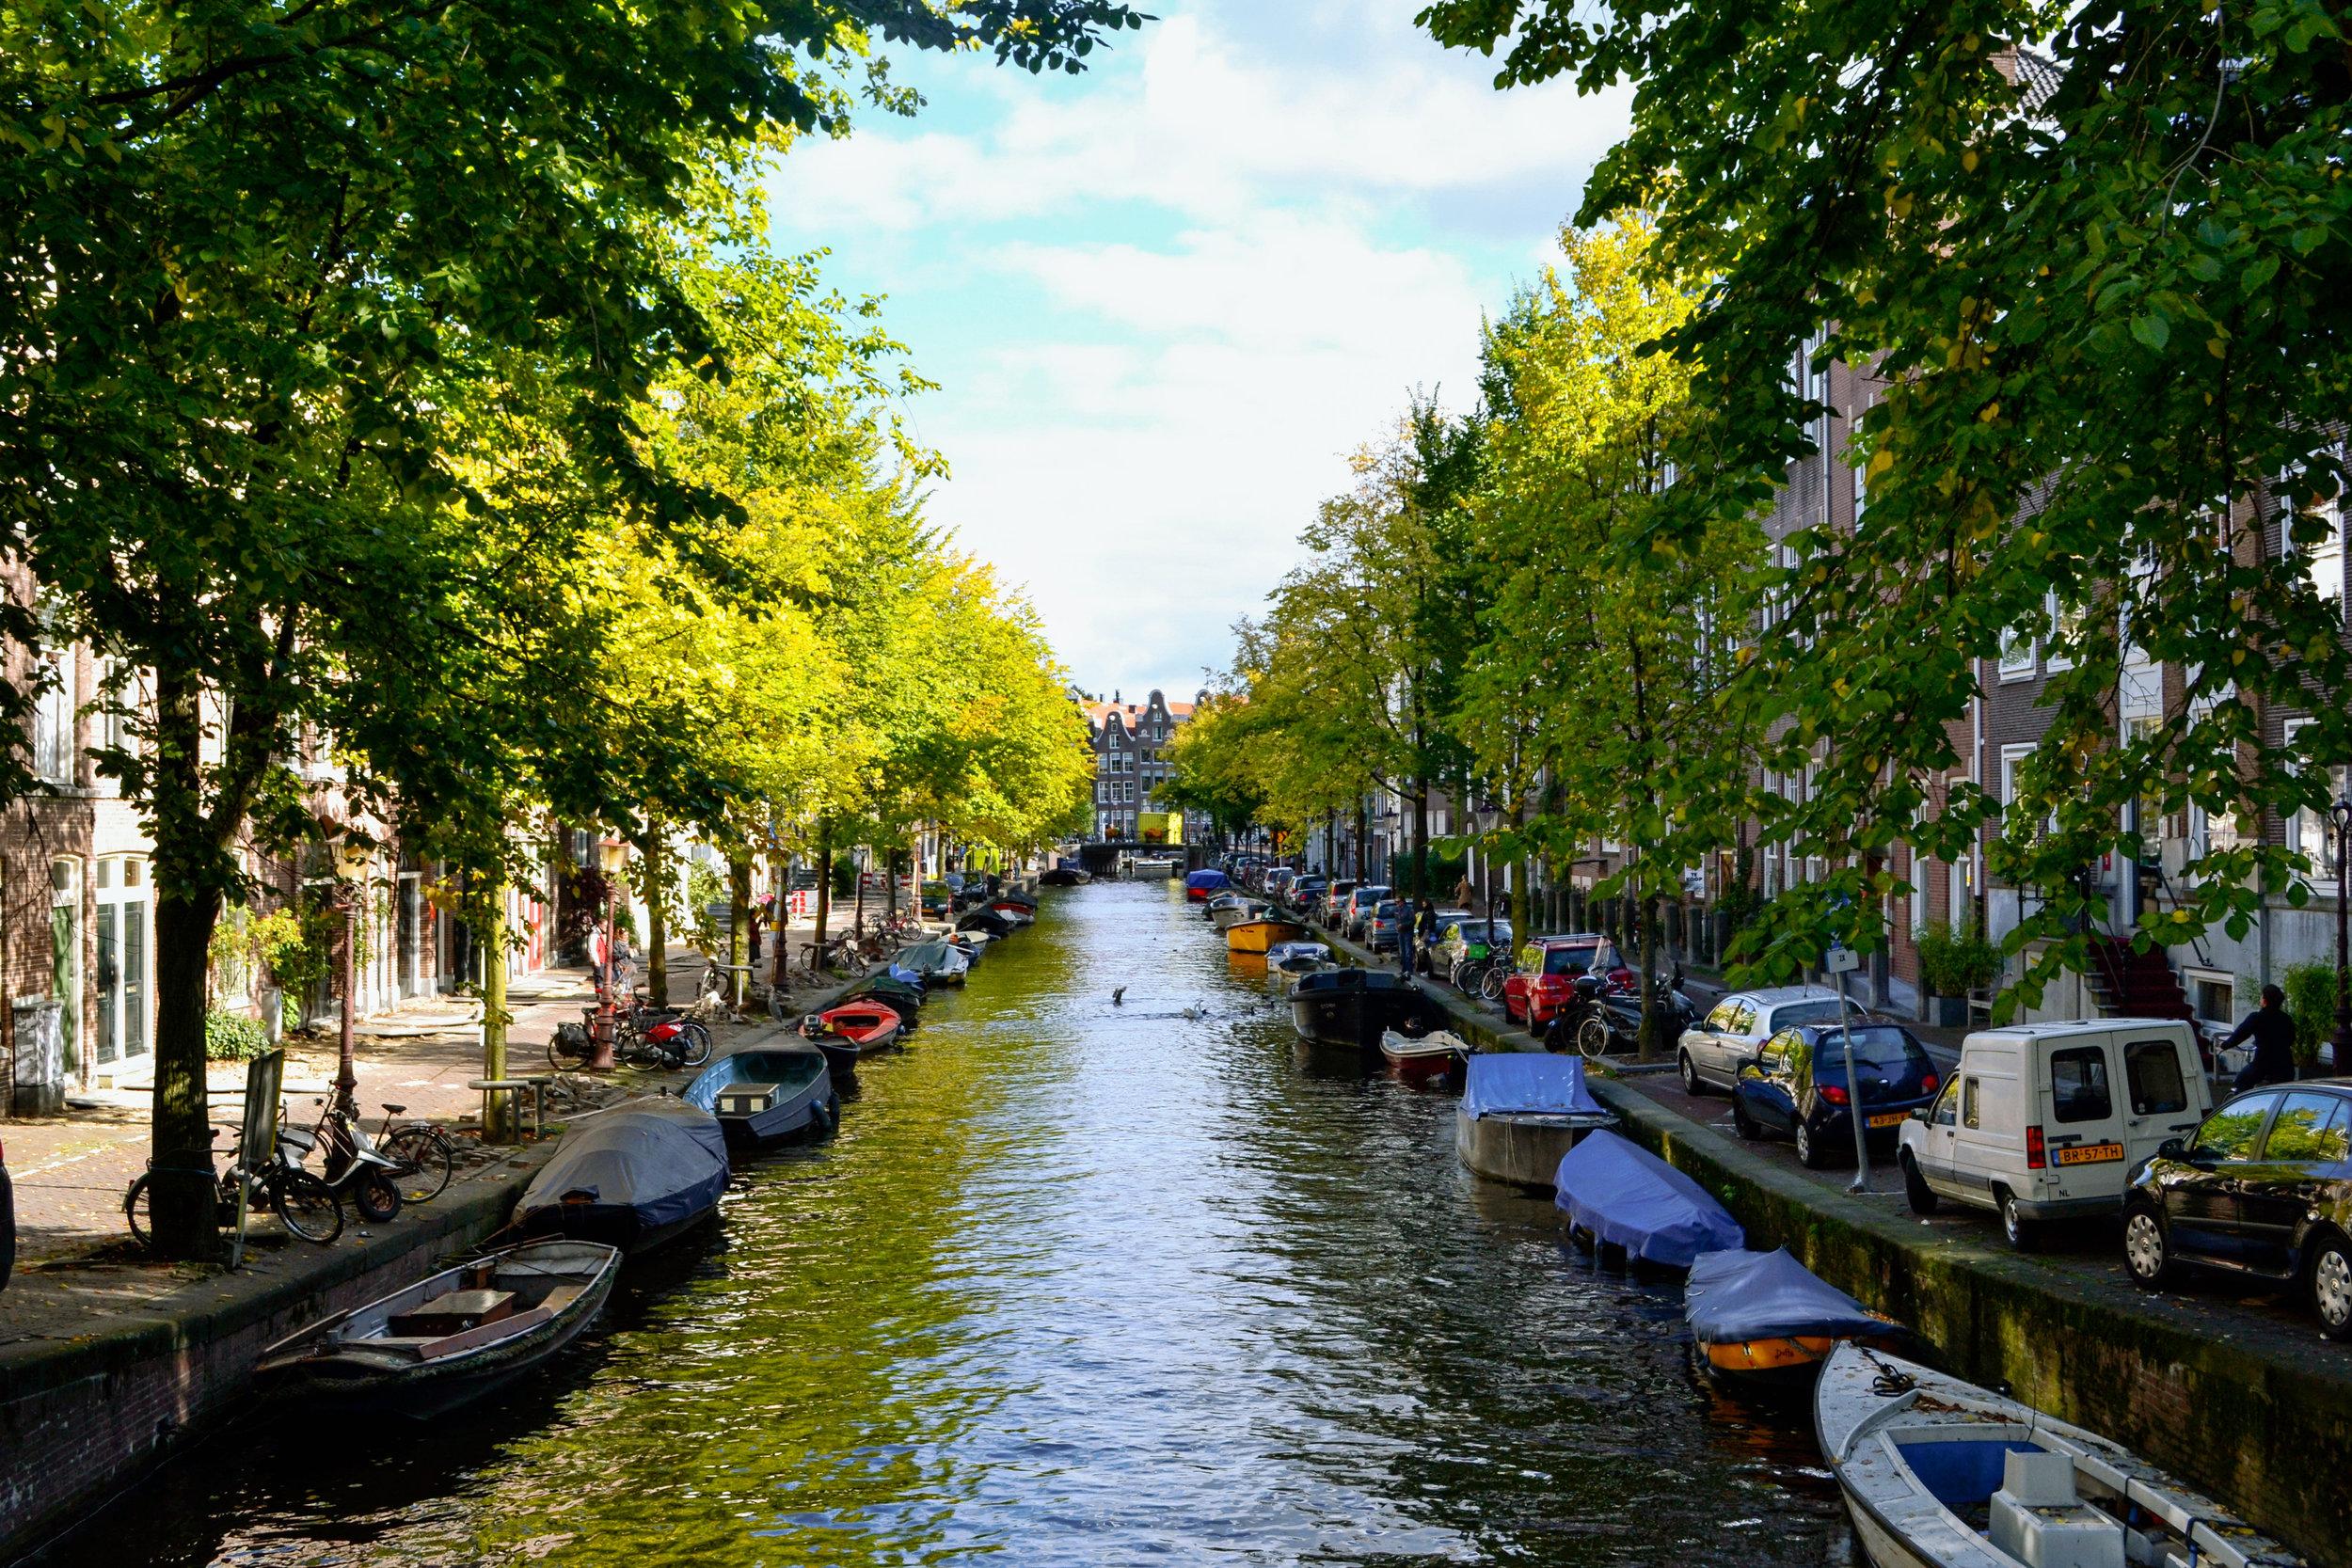 amsterdam-canal-02.jpg